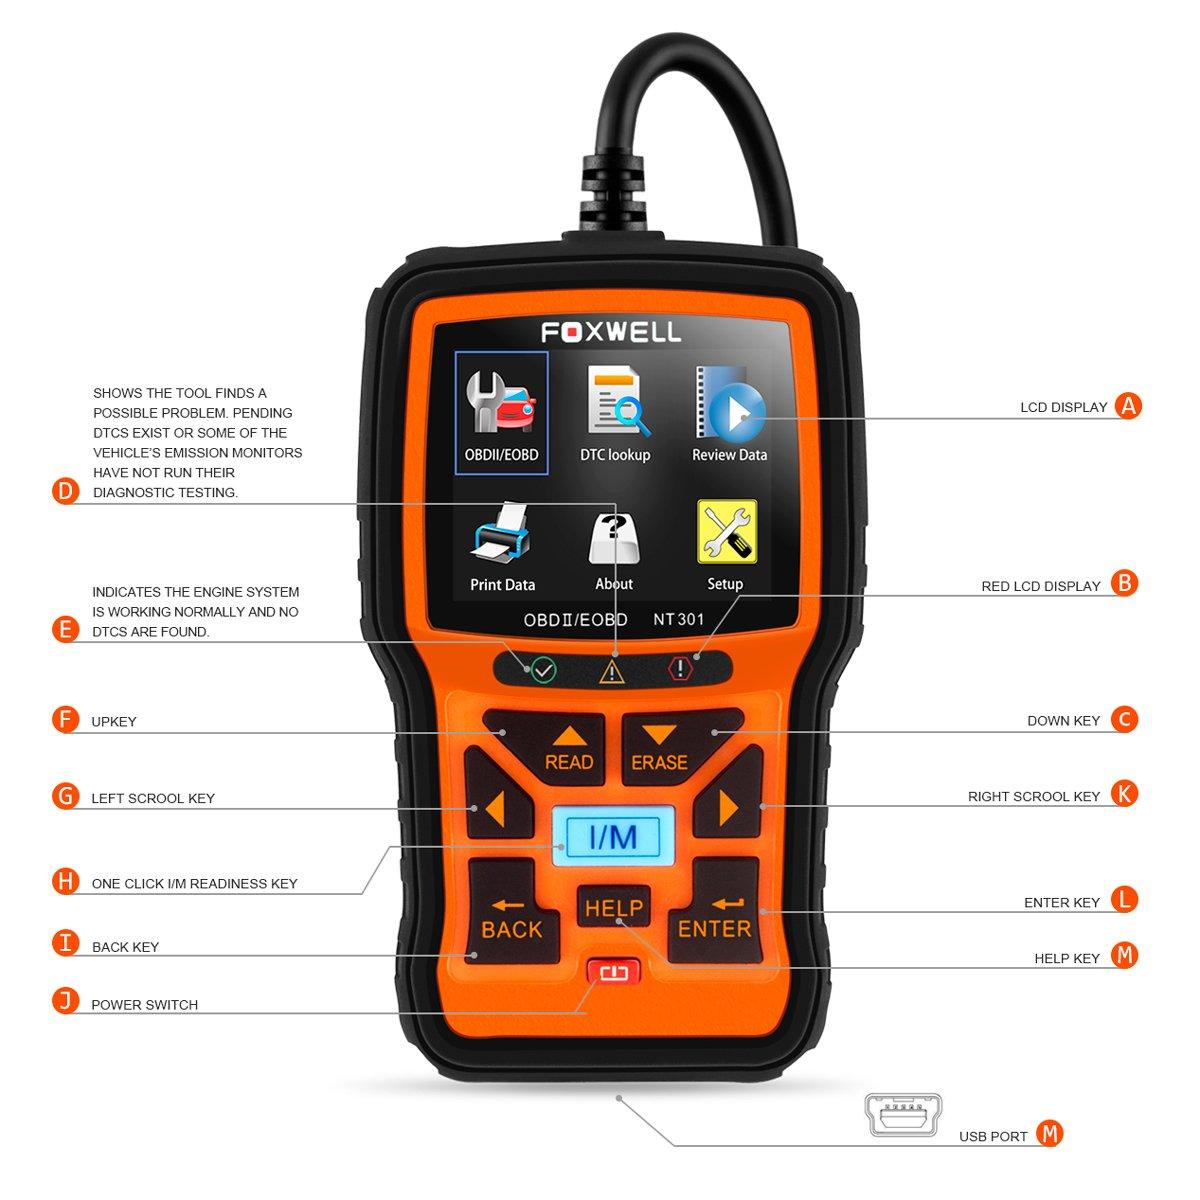 FOXWELL Nt301 Obd2 Code Scanner Universal Car Engine Diagnostic Tool